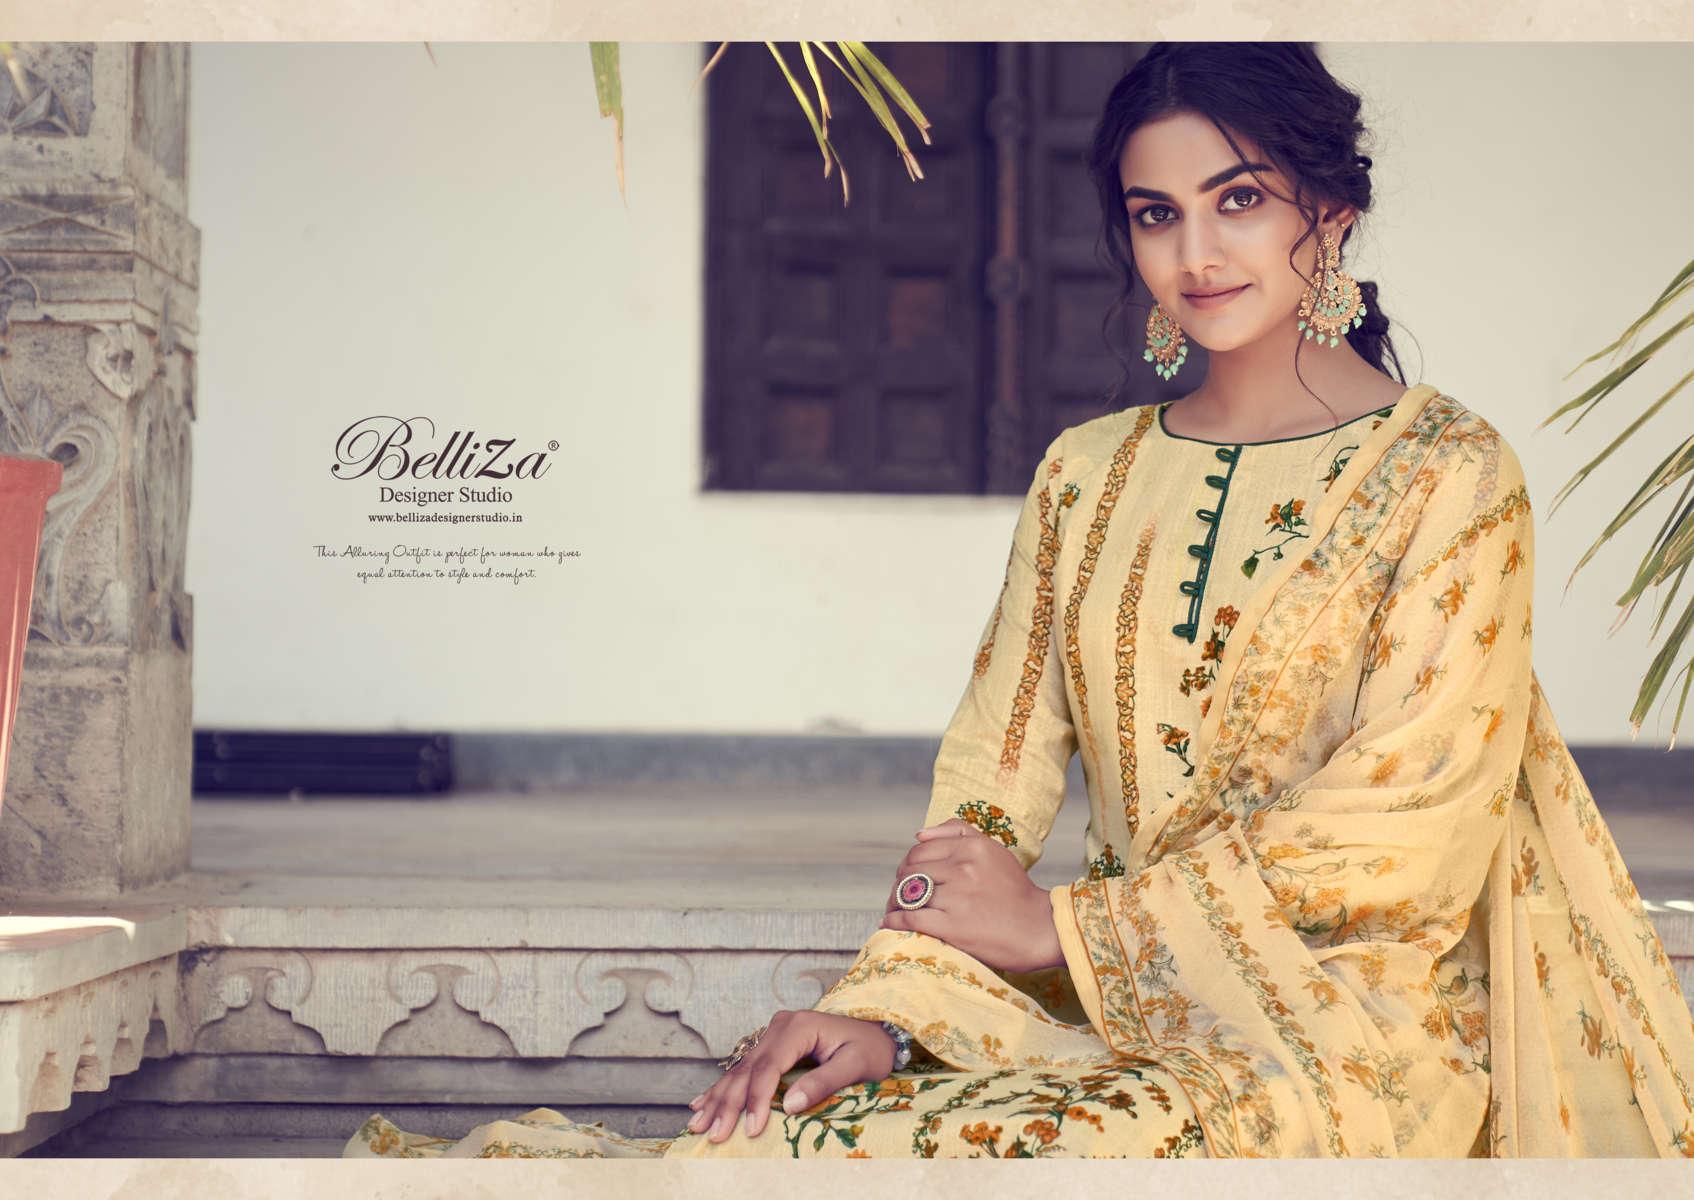 Belliza Nazia Salwar Suit Wholesale Catalog 10 Pcs 1 - Belliza Nazia Salwar Suit Wholesale Catalog 10 Pcs